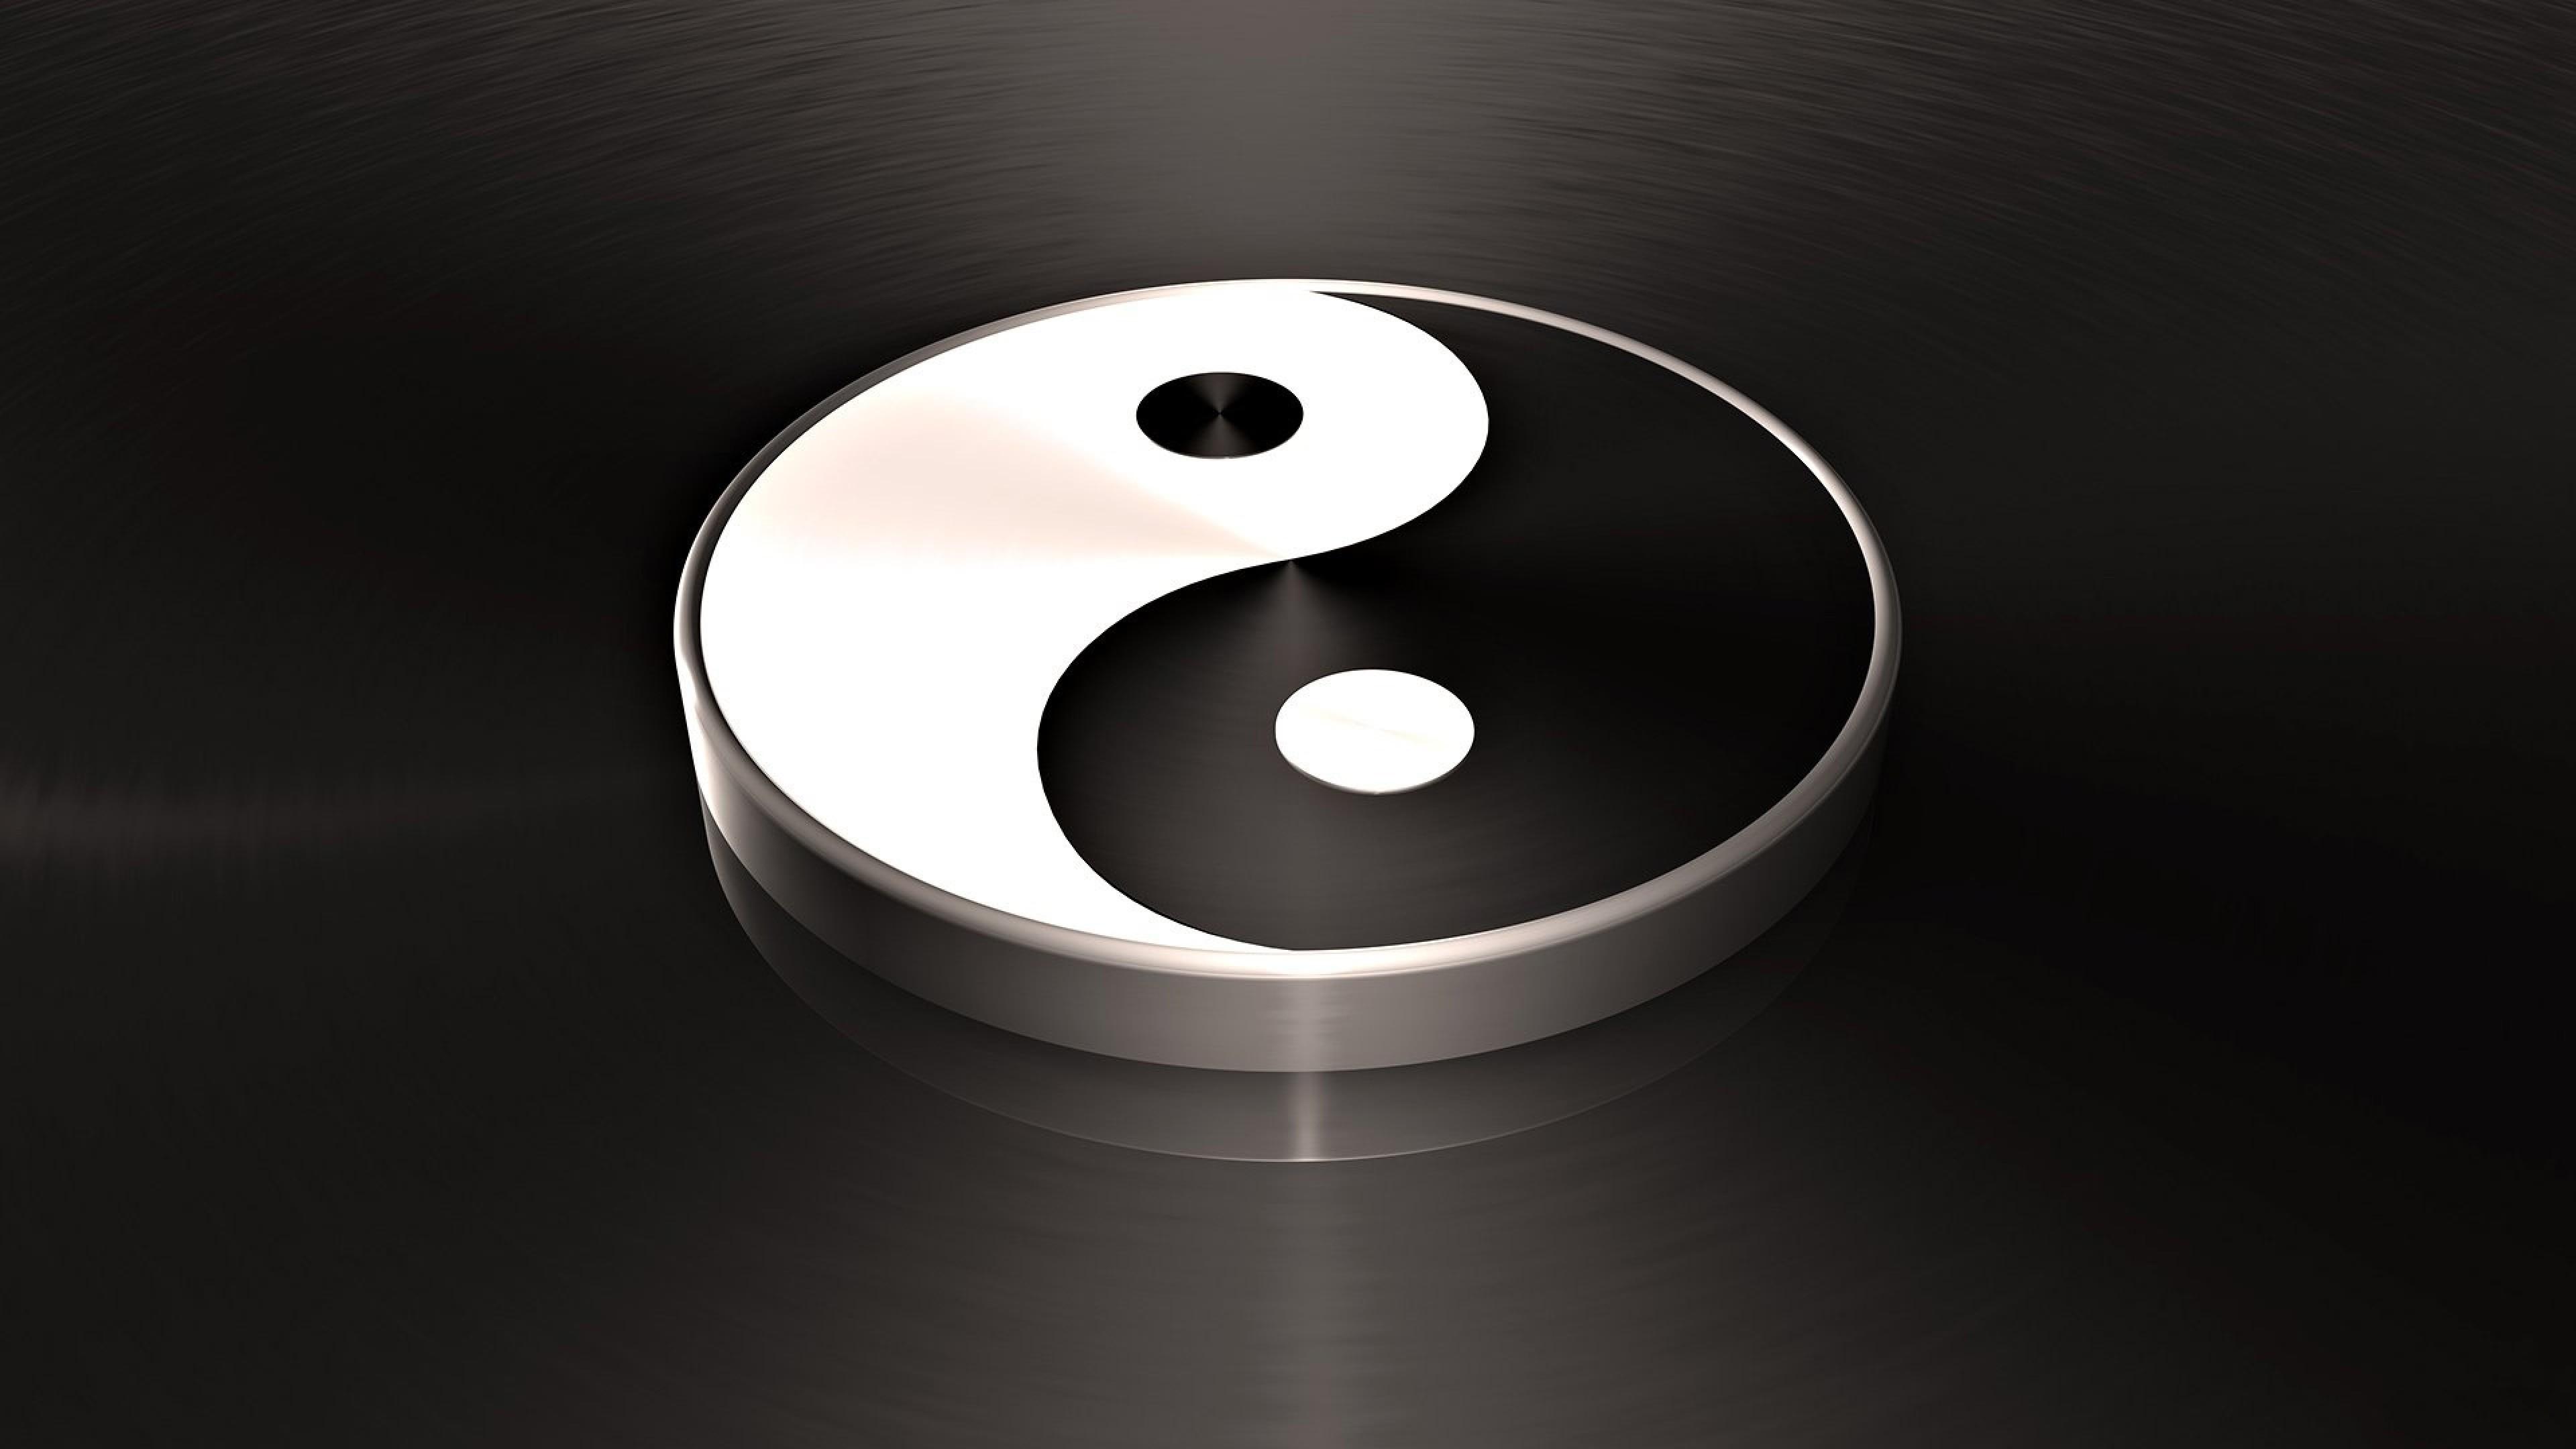 Cool Yin Yang Wallpaper 61 Images